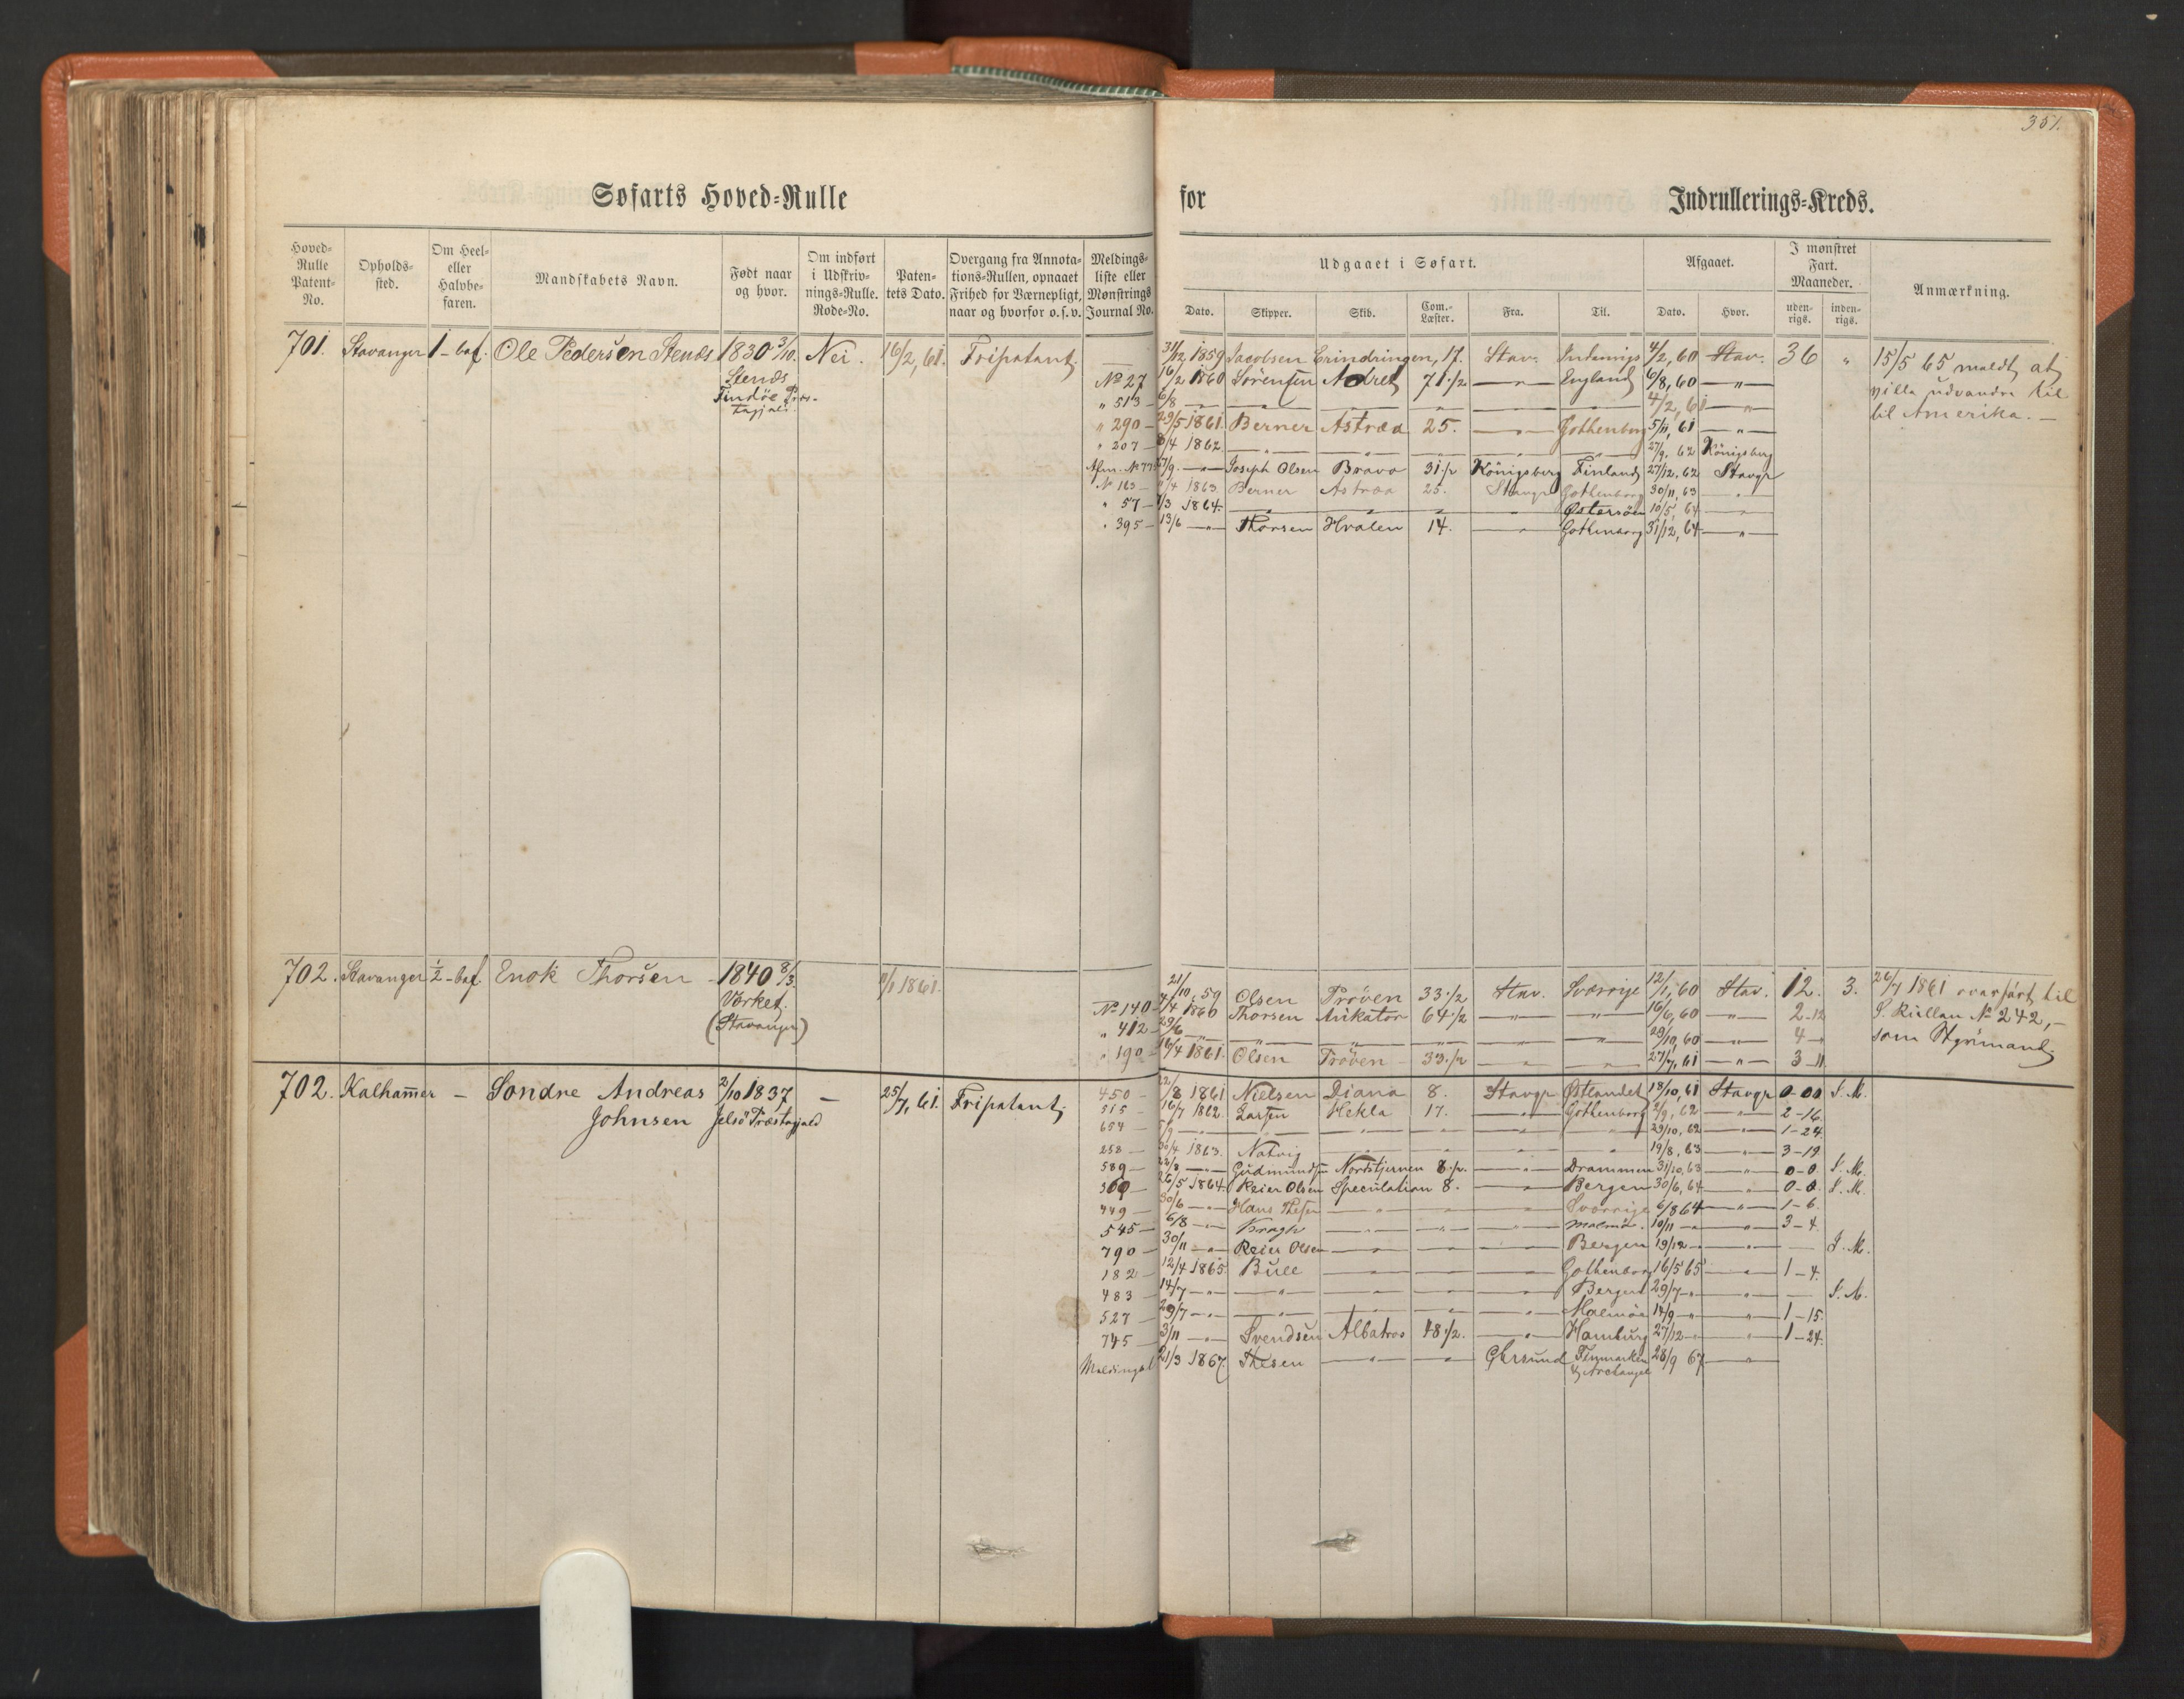 SAST, Stavanger sjømannskontor, F/Fb/Fbb/L0001: Sjøfartshovedrulle, patentnr. 1-720 (del 1), 1860-1863, s. 355